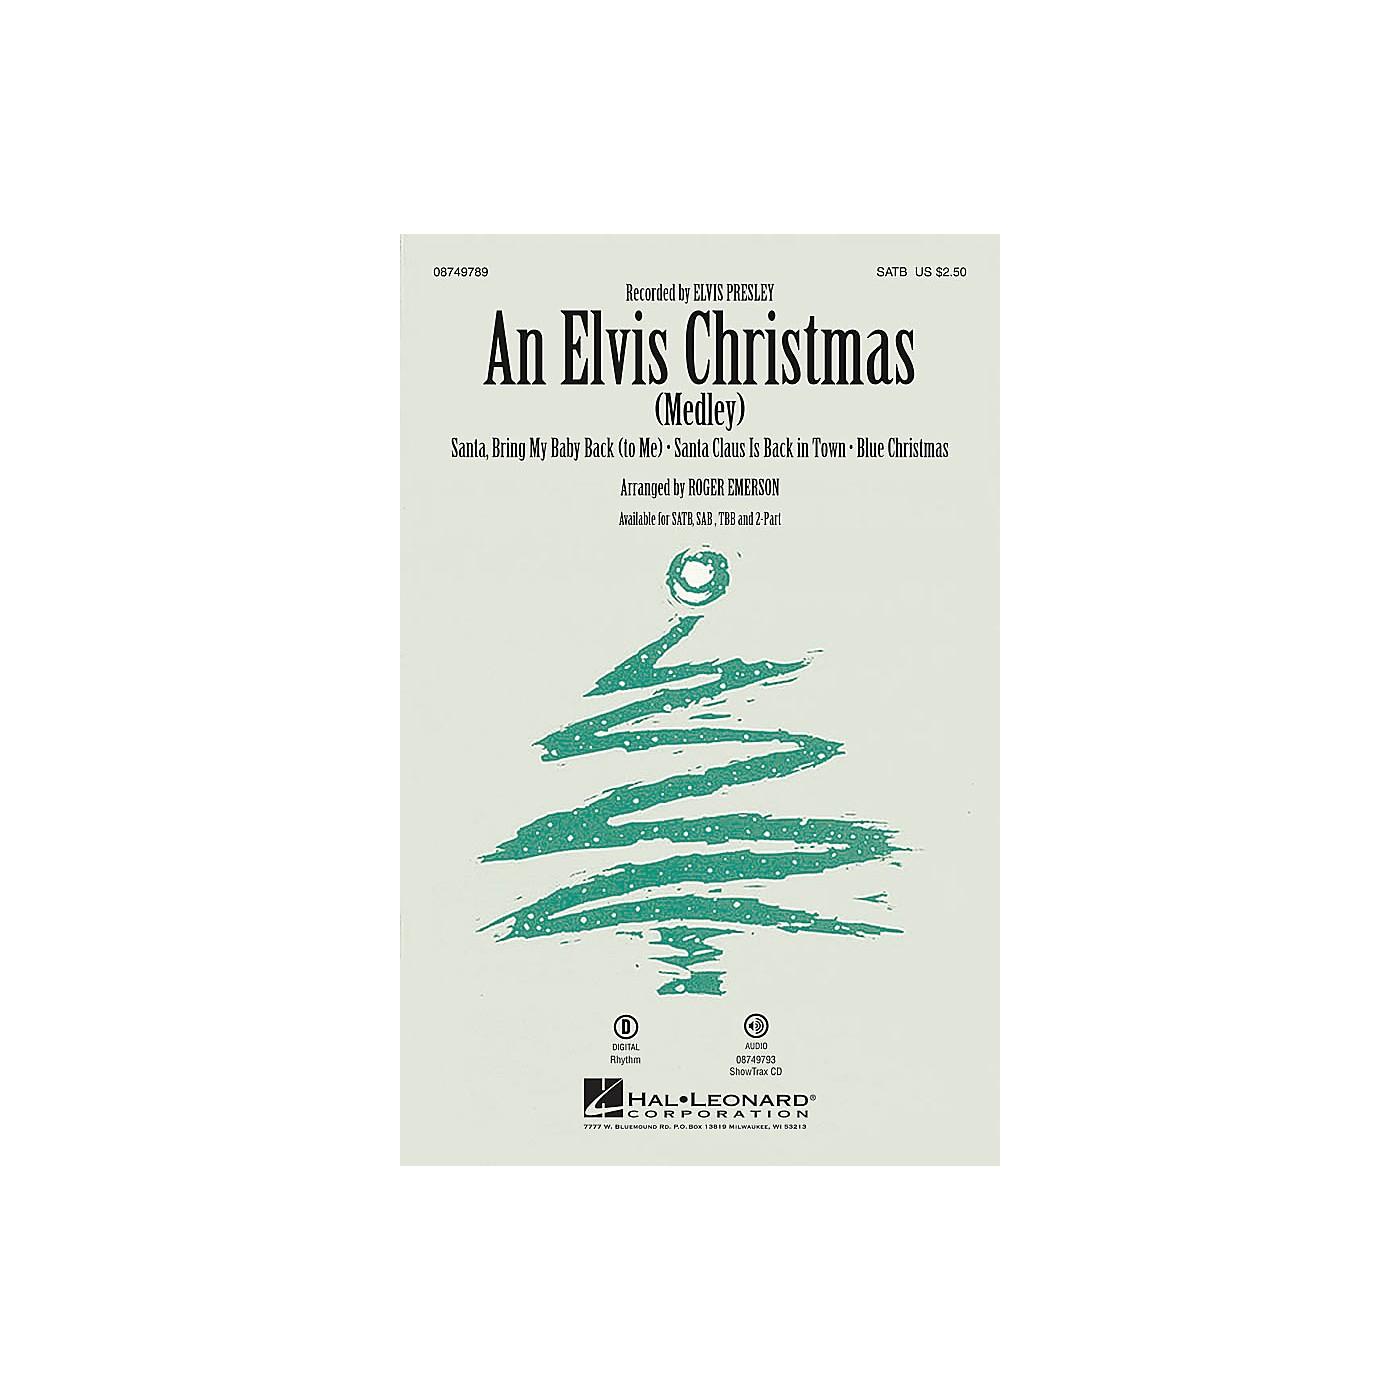 Hal Leonard An Elvis Christmas 2-Part by Elvis Presley Arranged by Roger Emerson thumbnail